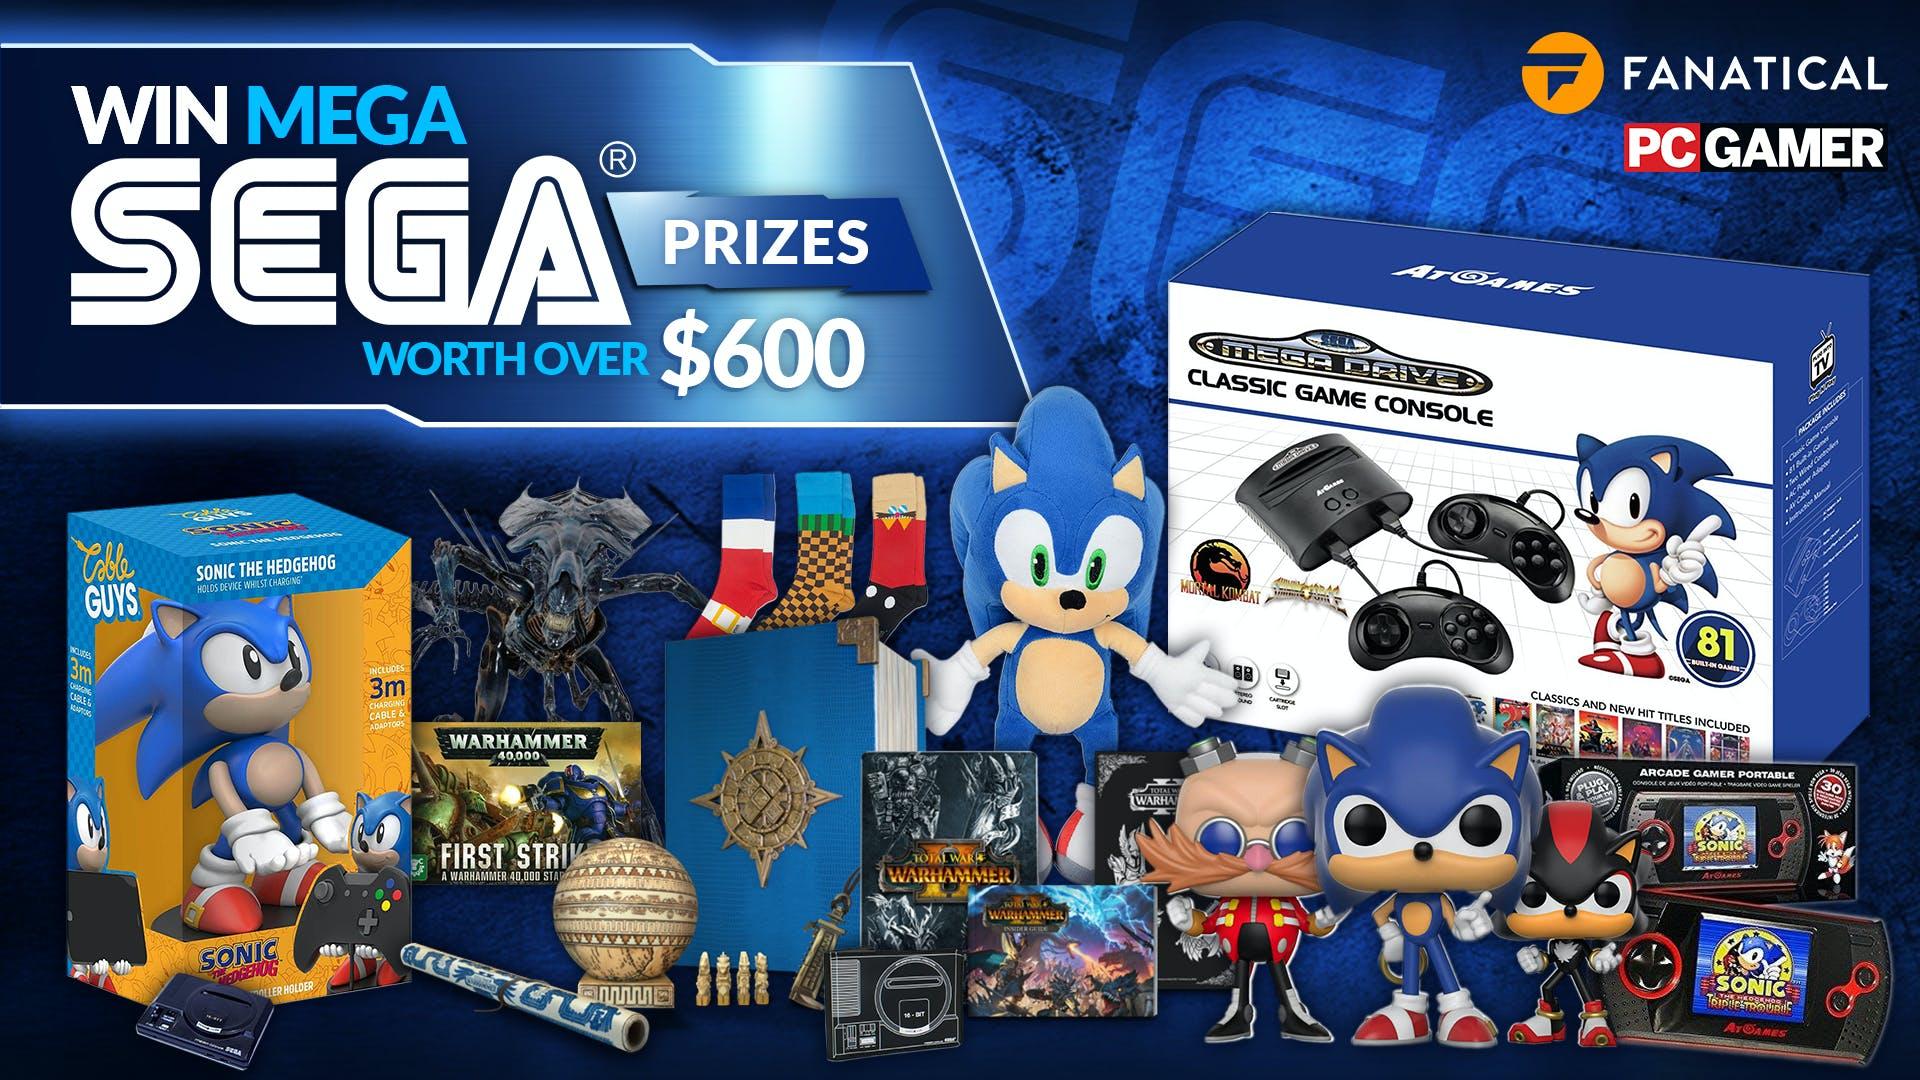 https://images.prismic.io/fanatical/e11229c0279b5159f65d30a95396377adc485c56_sega-contest-cover-prizes-day06.jpg?auto=compress,format